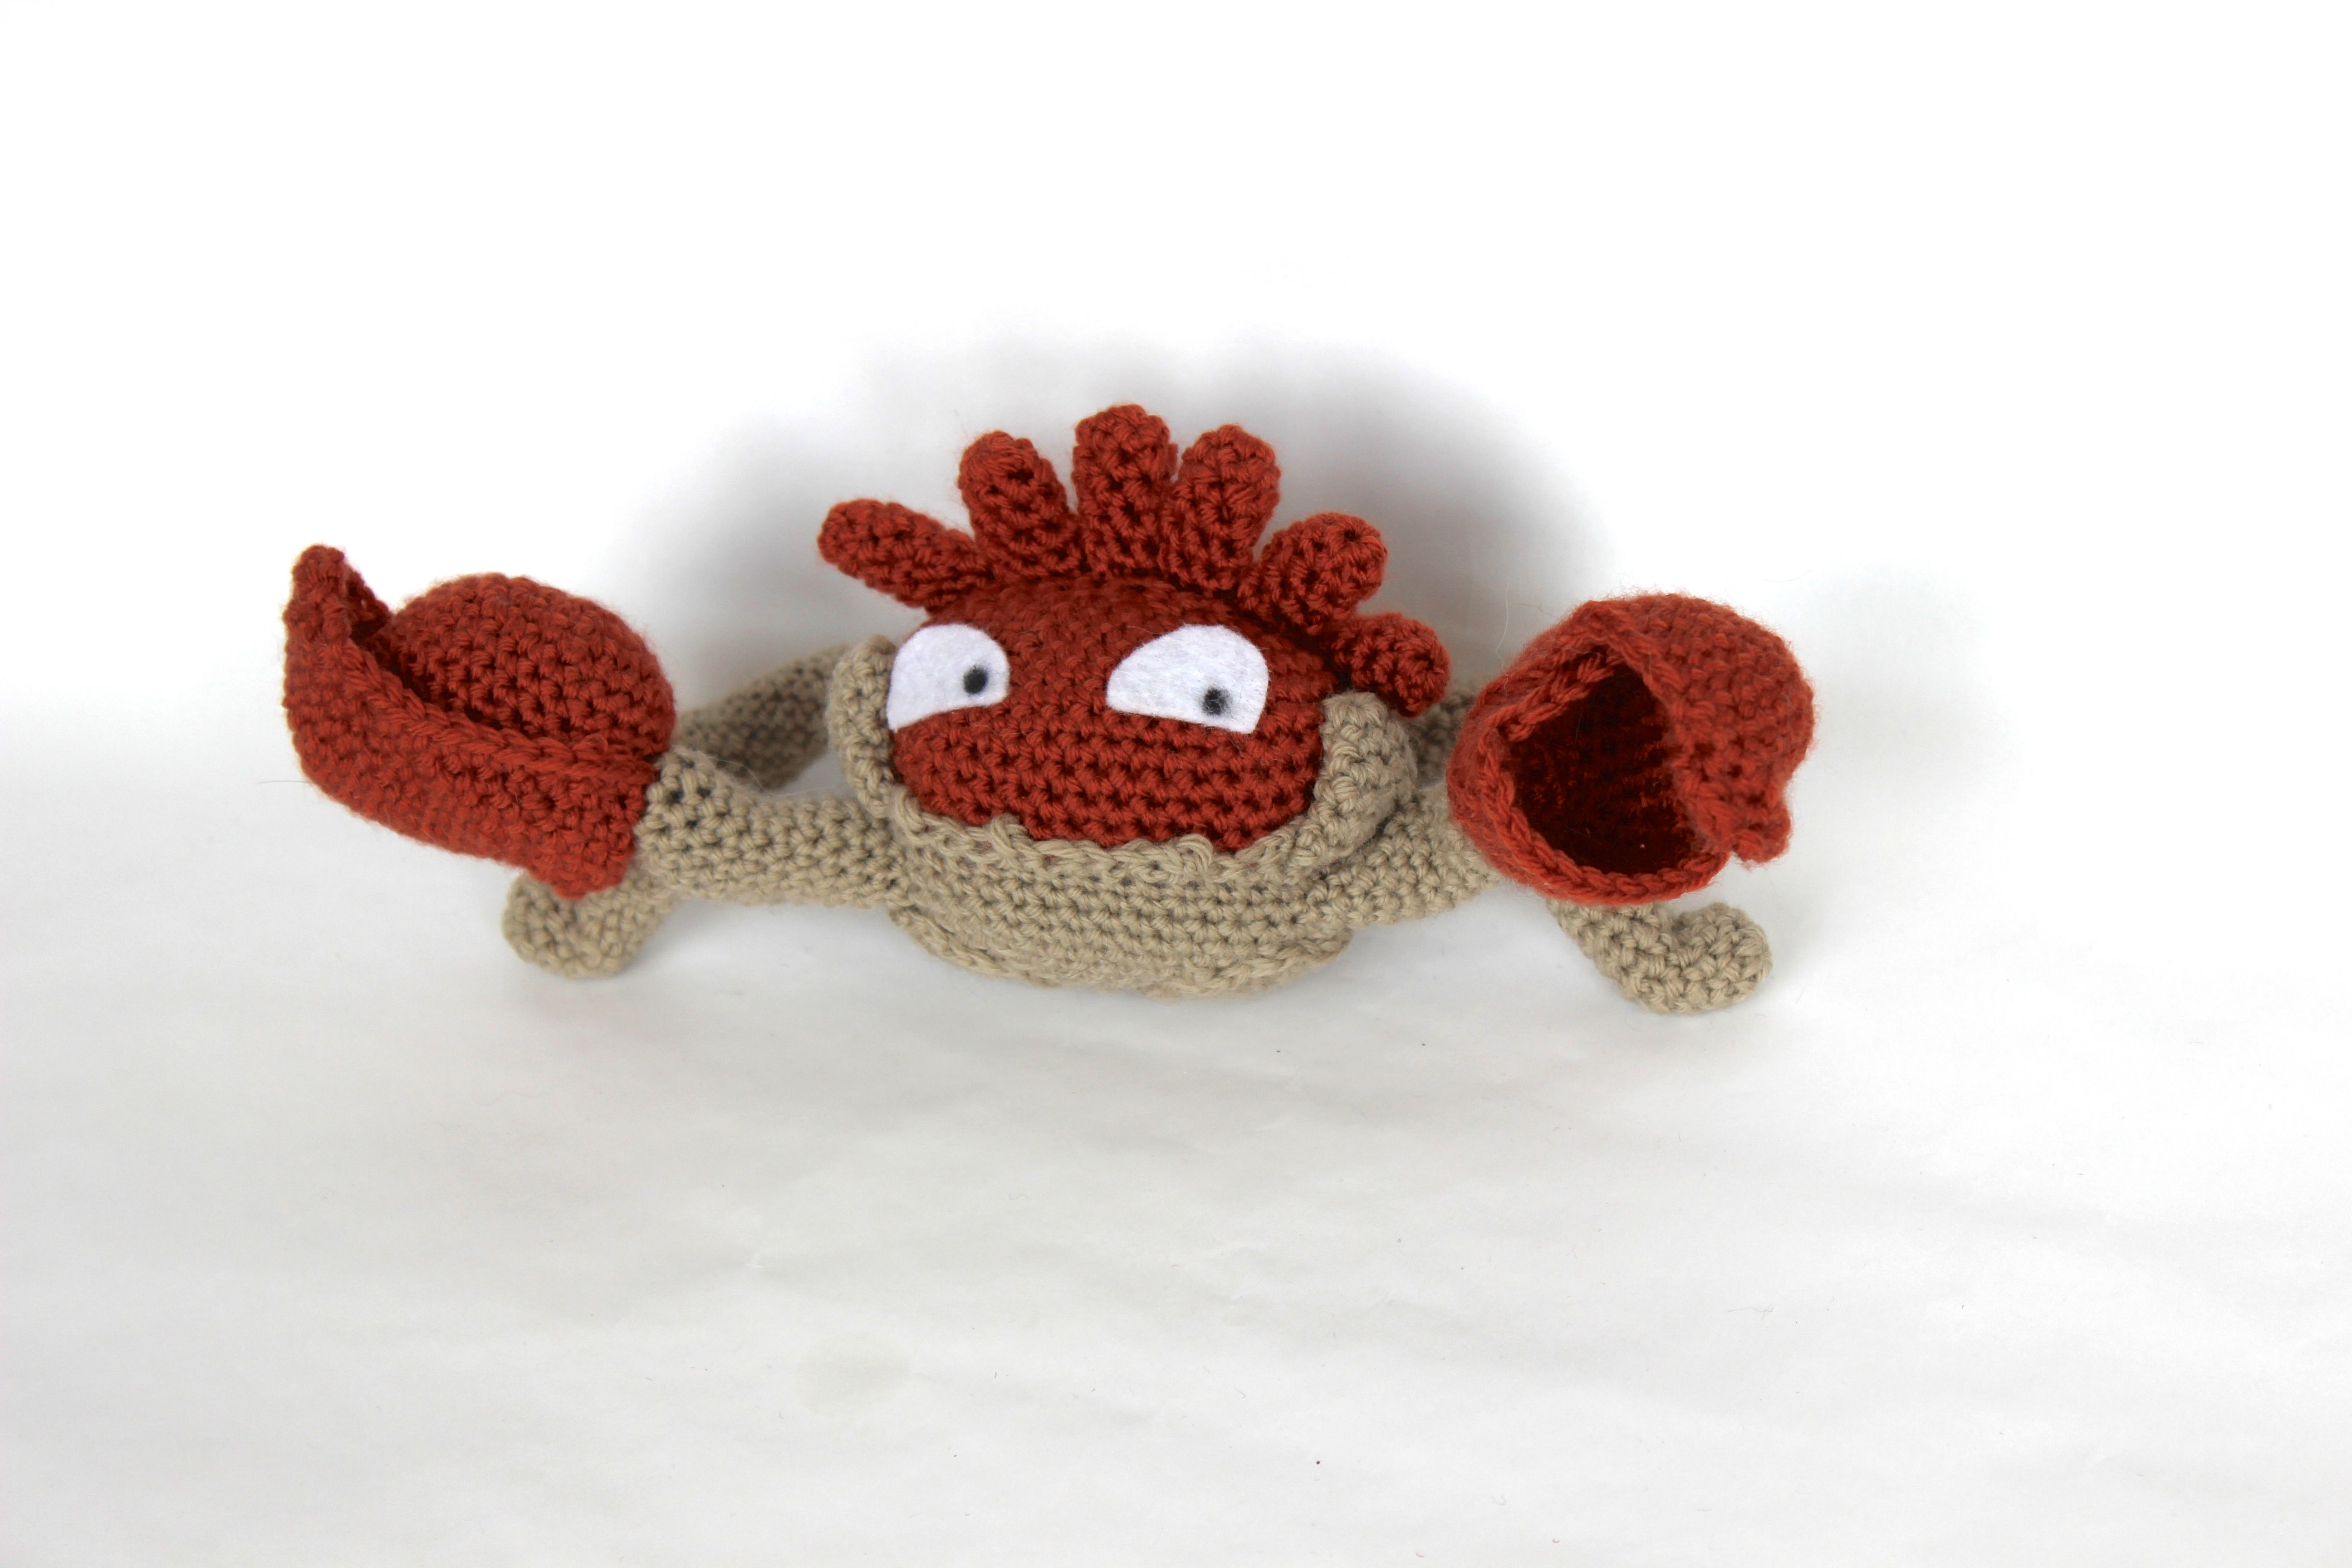 099 kingler crochet | Nifty ideas | Pinterest | Pokémon y Ganchillo